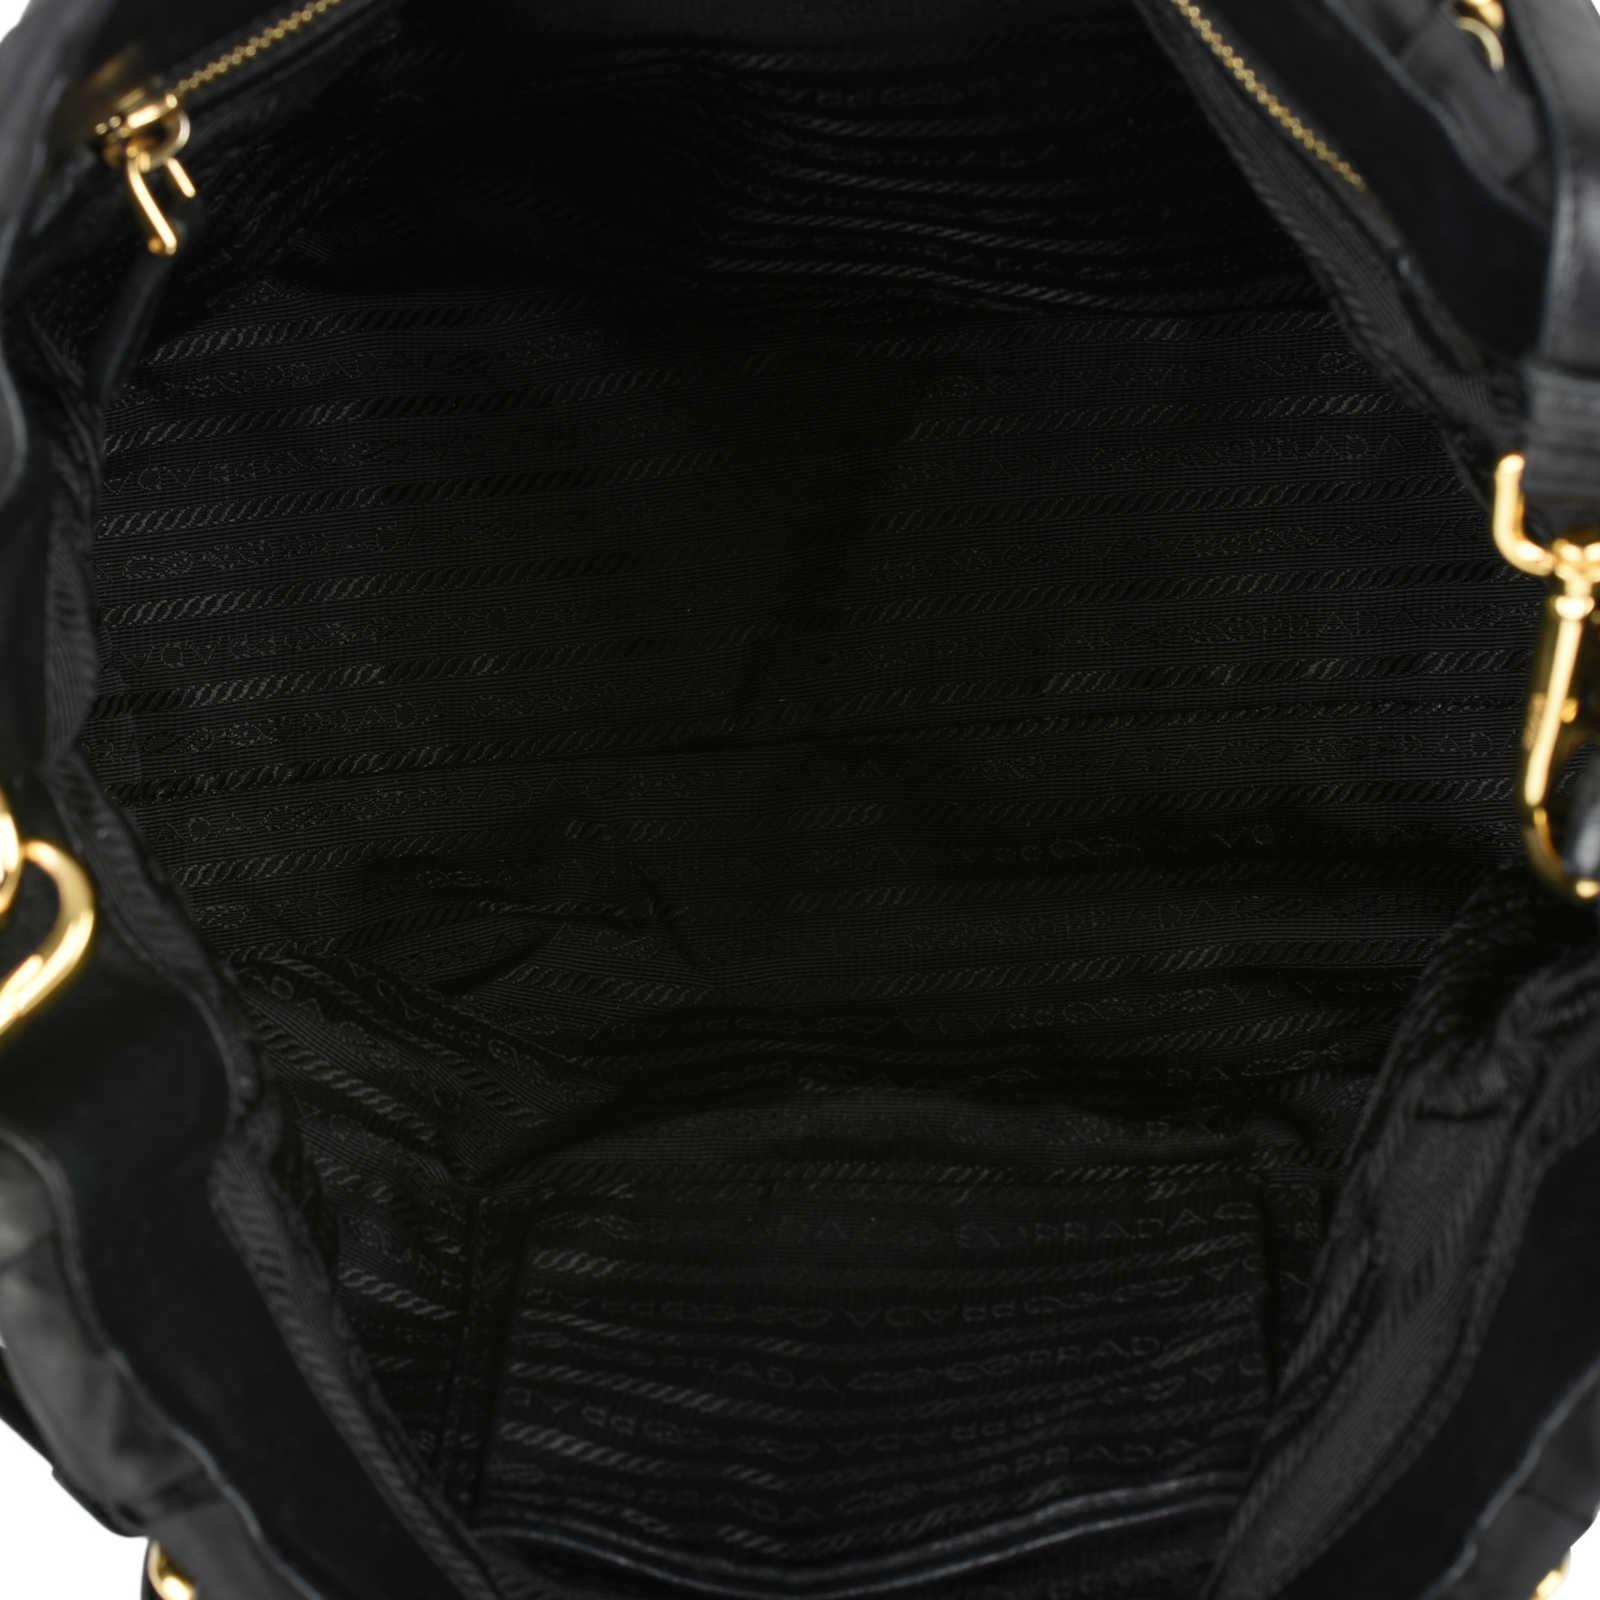 f464035c3662 ... Authentic Second Hand Prada Tessuto Gaufre Bag (PSS-446-00010) -  Thumbnail